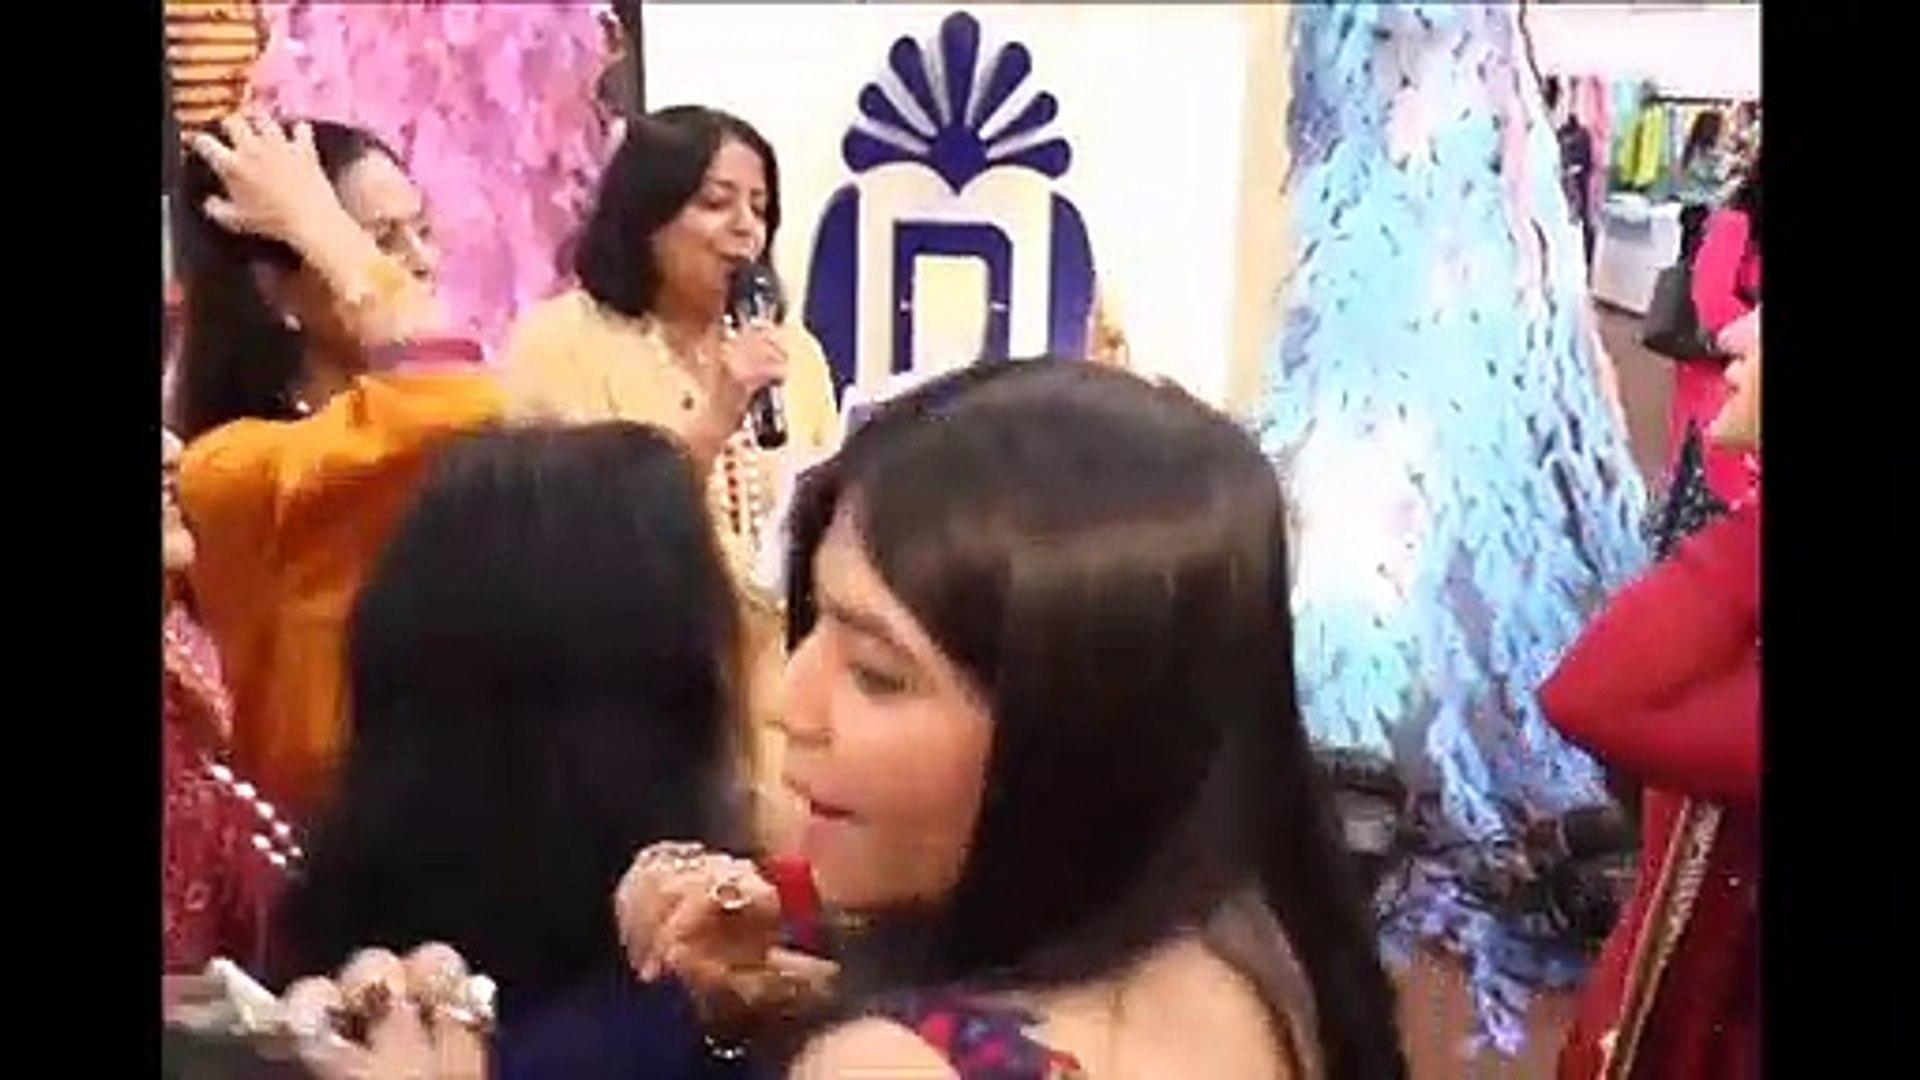 Ekta Kapoor In Transparent Dress & Reveales Her Big Melons!!